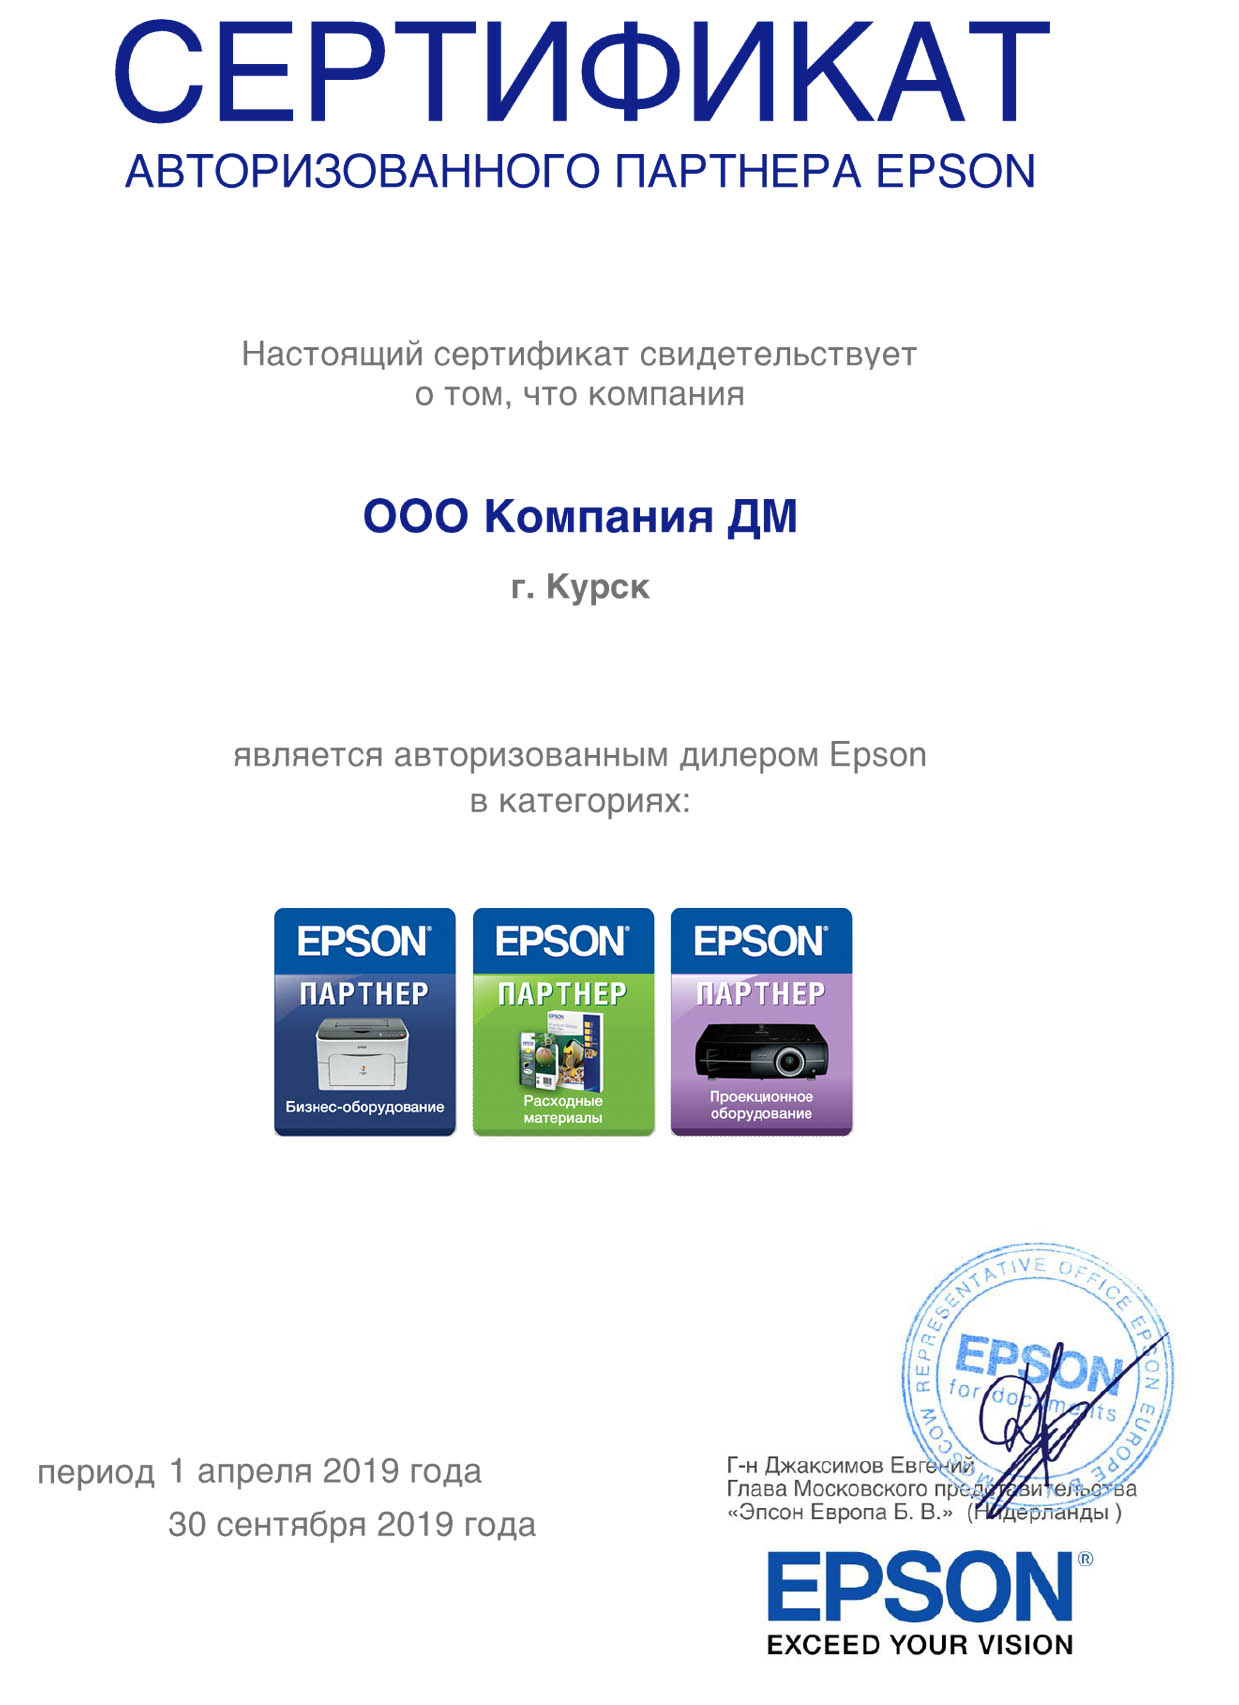 Epson 2019 компания DM